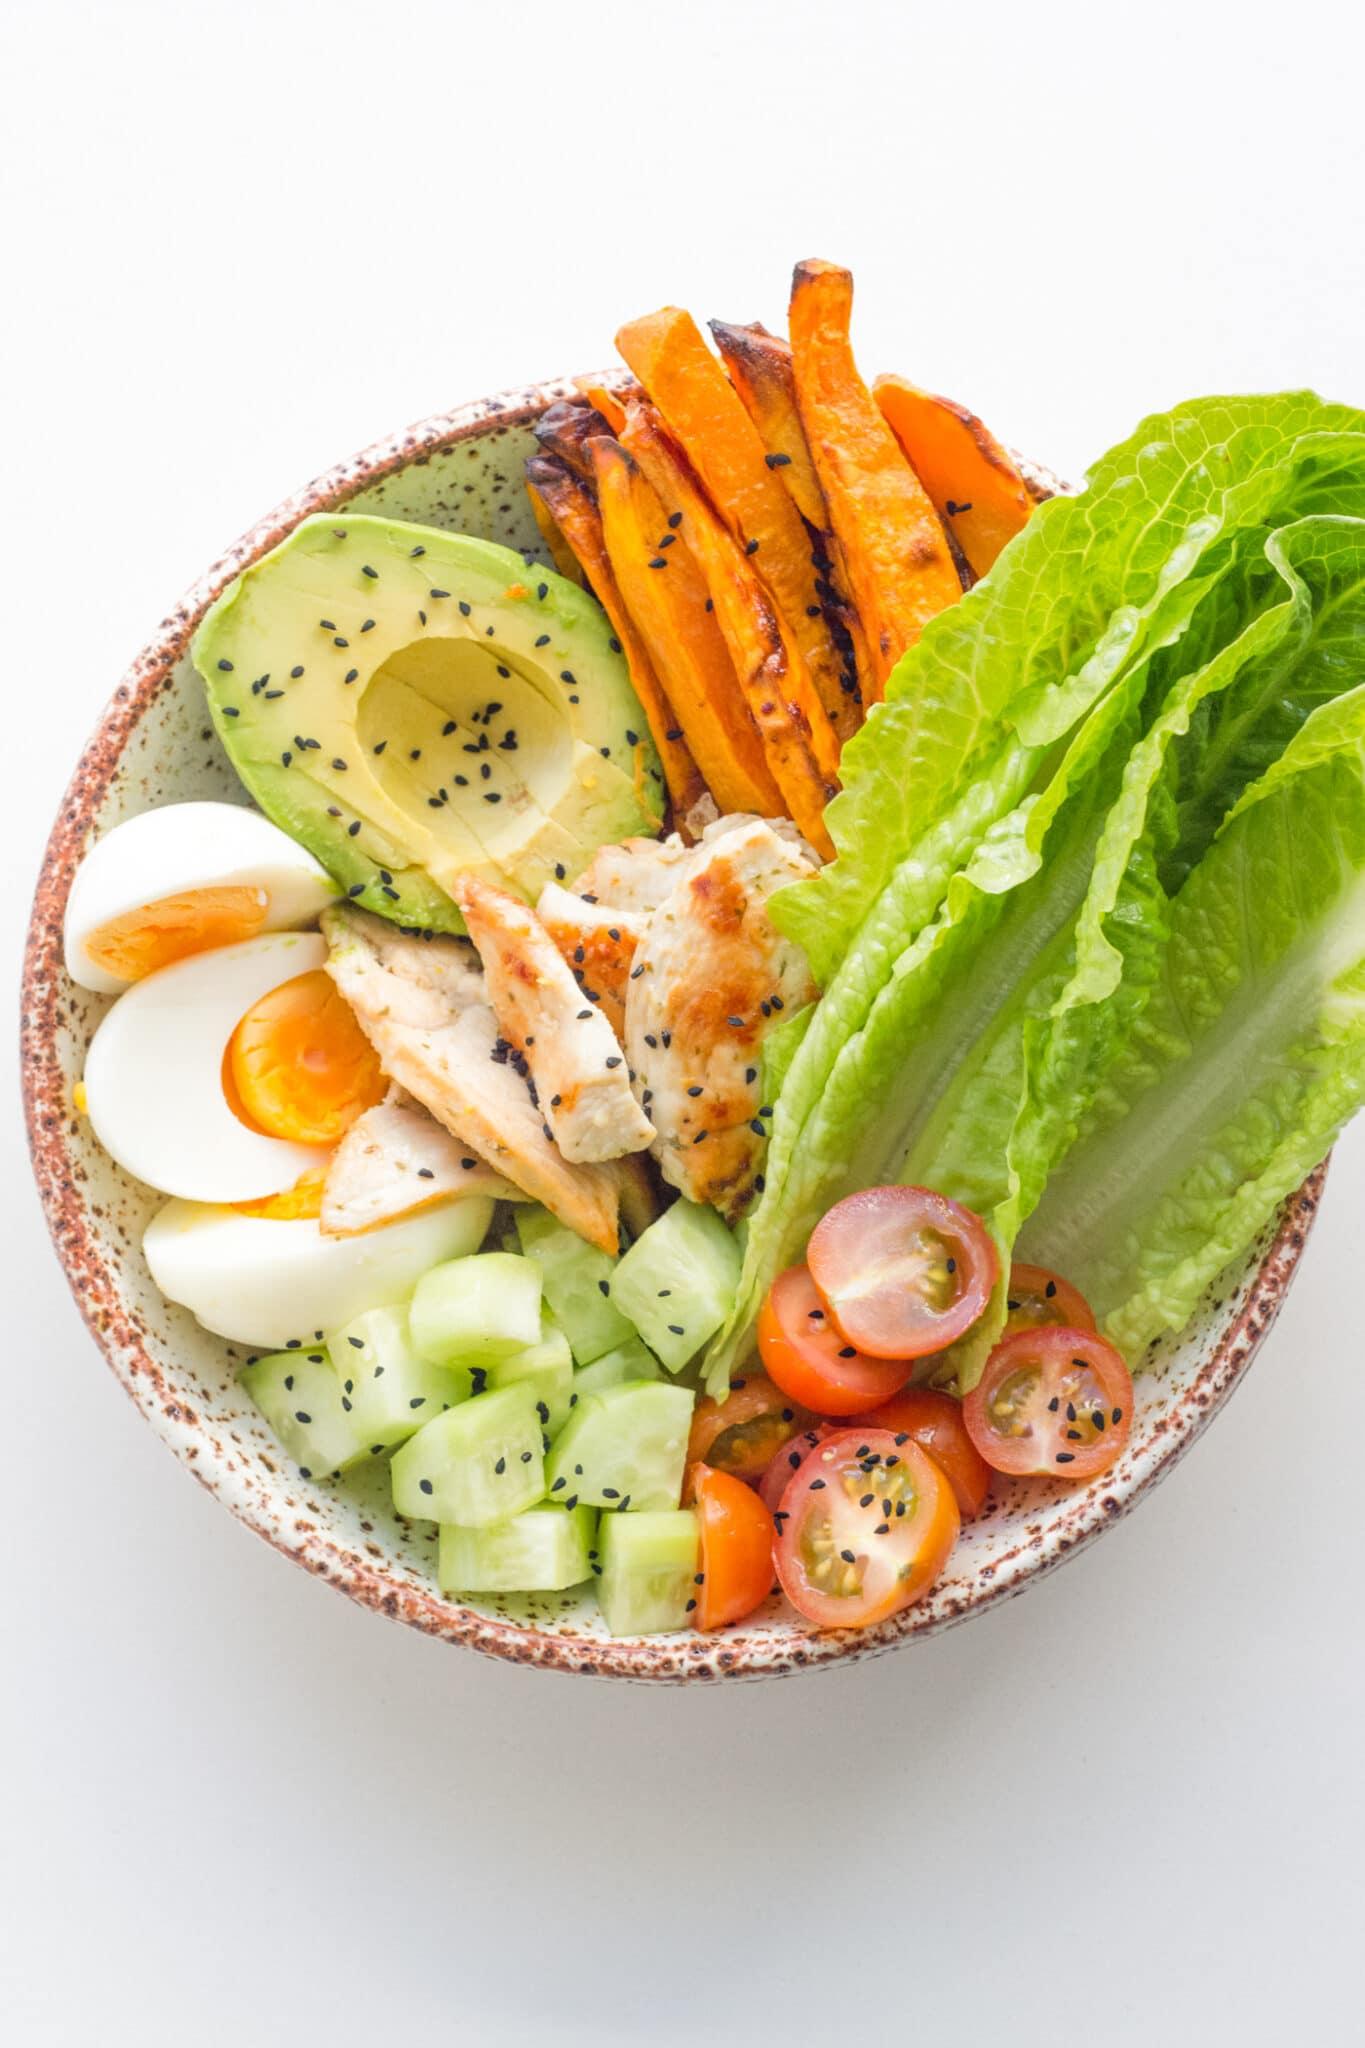 photo of the lemon garlic chicken buddha bowl with sweet potato, avocado, egg, cucumber, cherry tomato, lettuce and chicken.